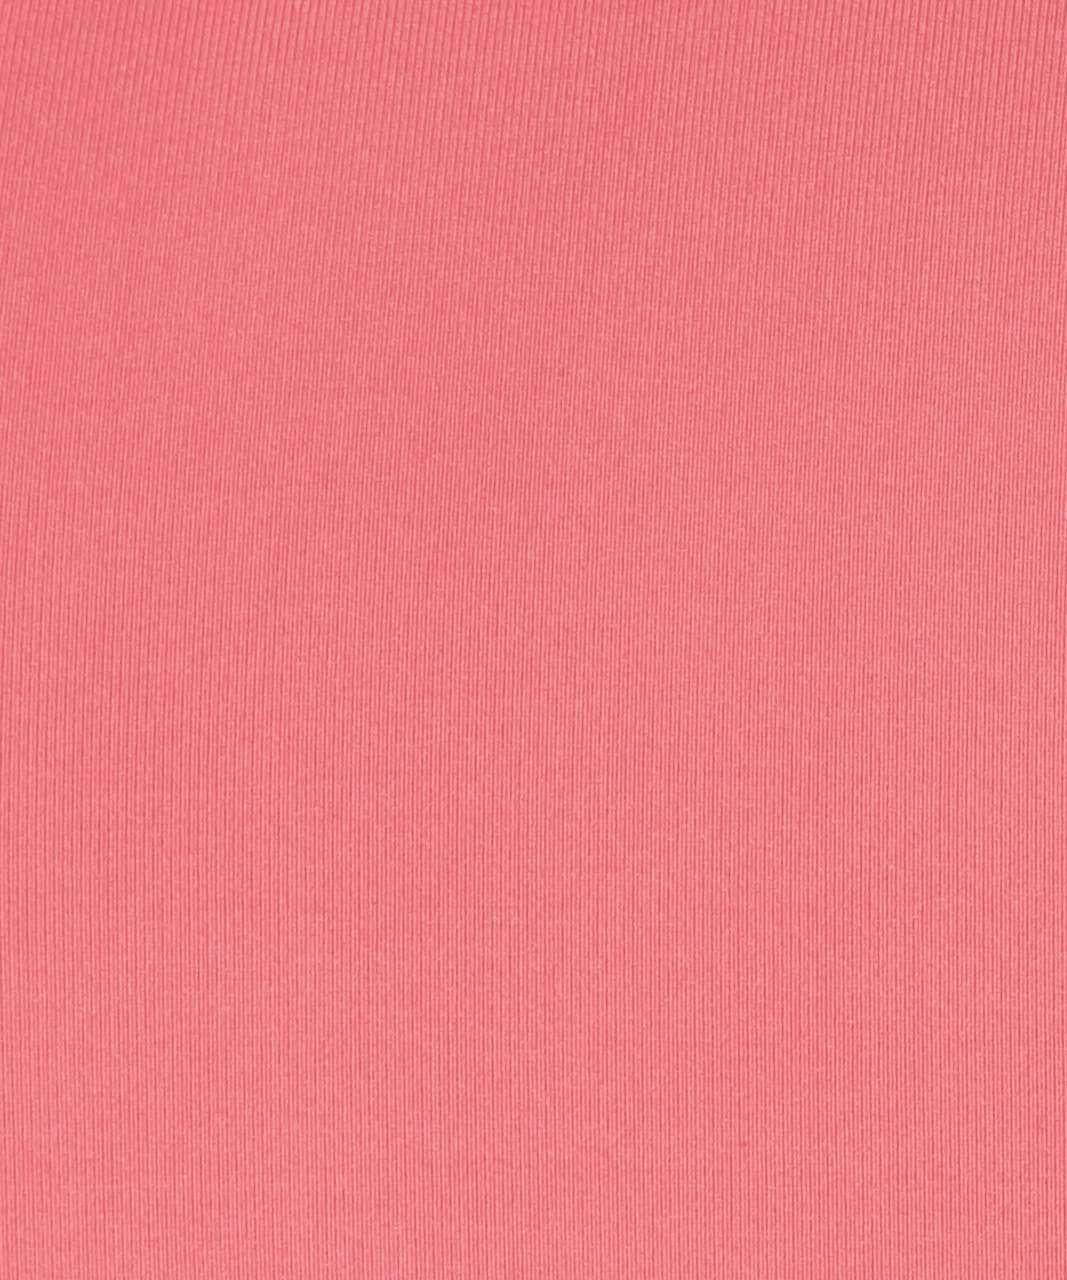 Lululemon Free To Be Serene Bra - Blush Coral